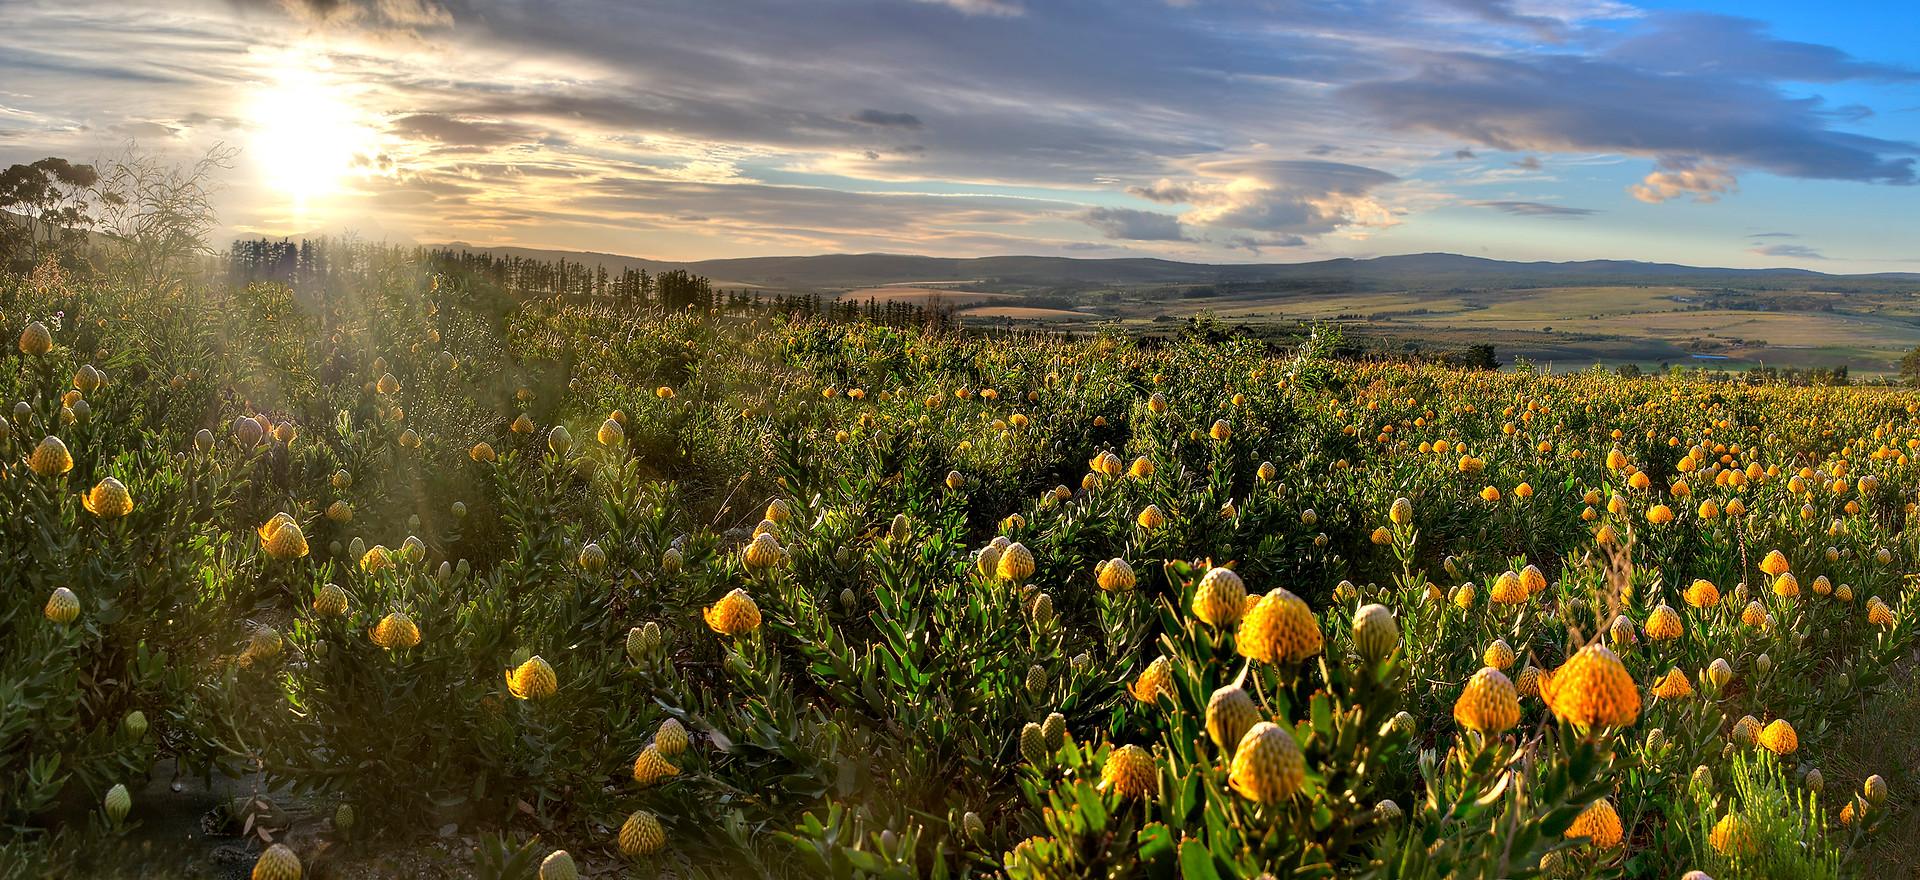 Protea fields, Stanford Hills